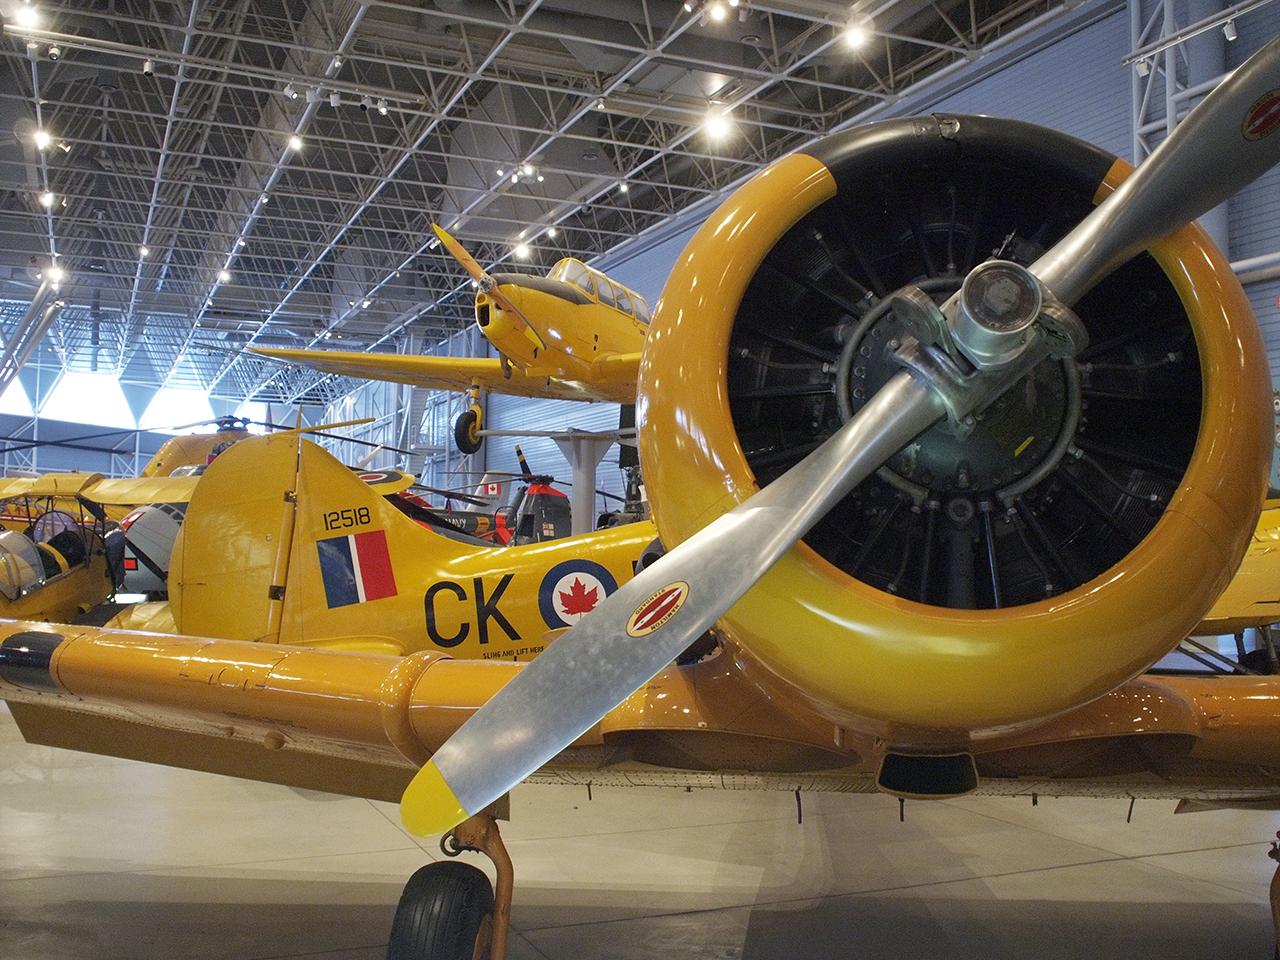 a yellow propeller aircraft